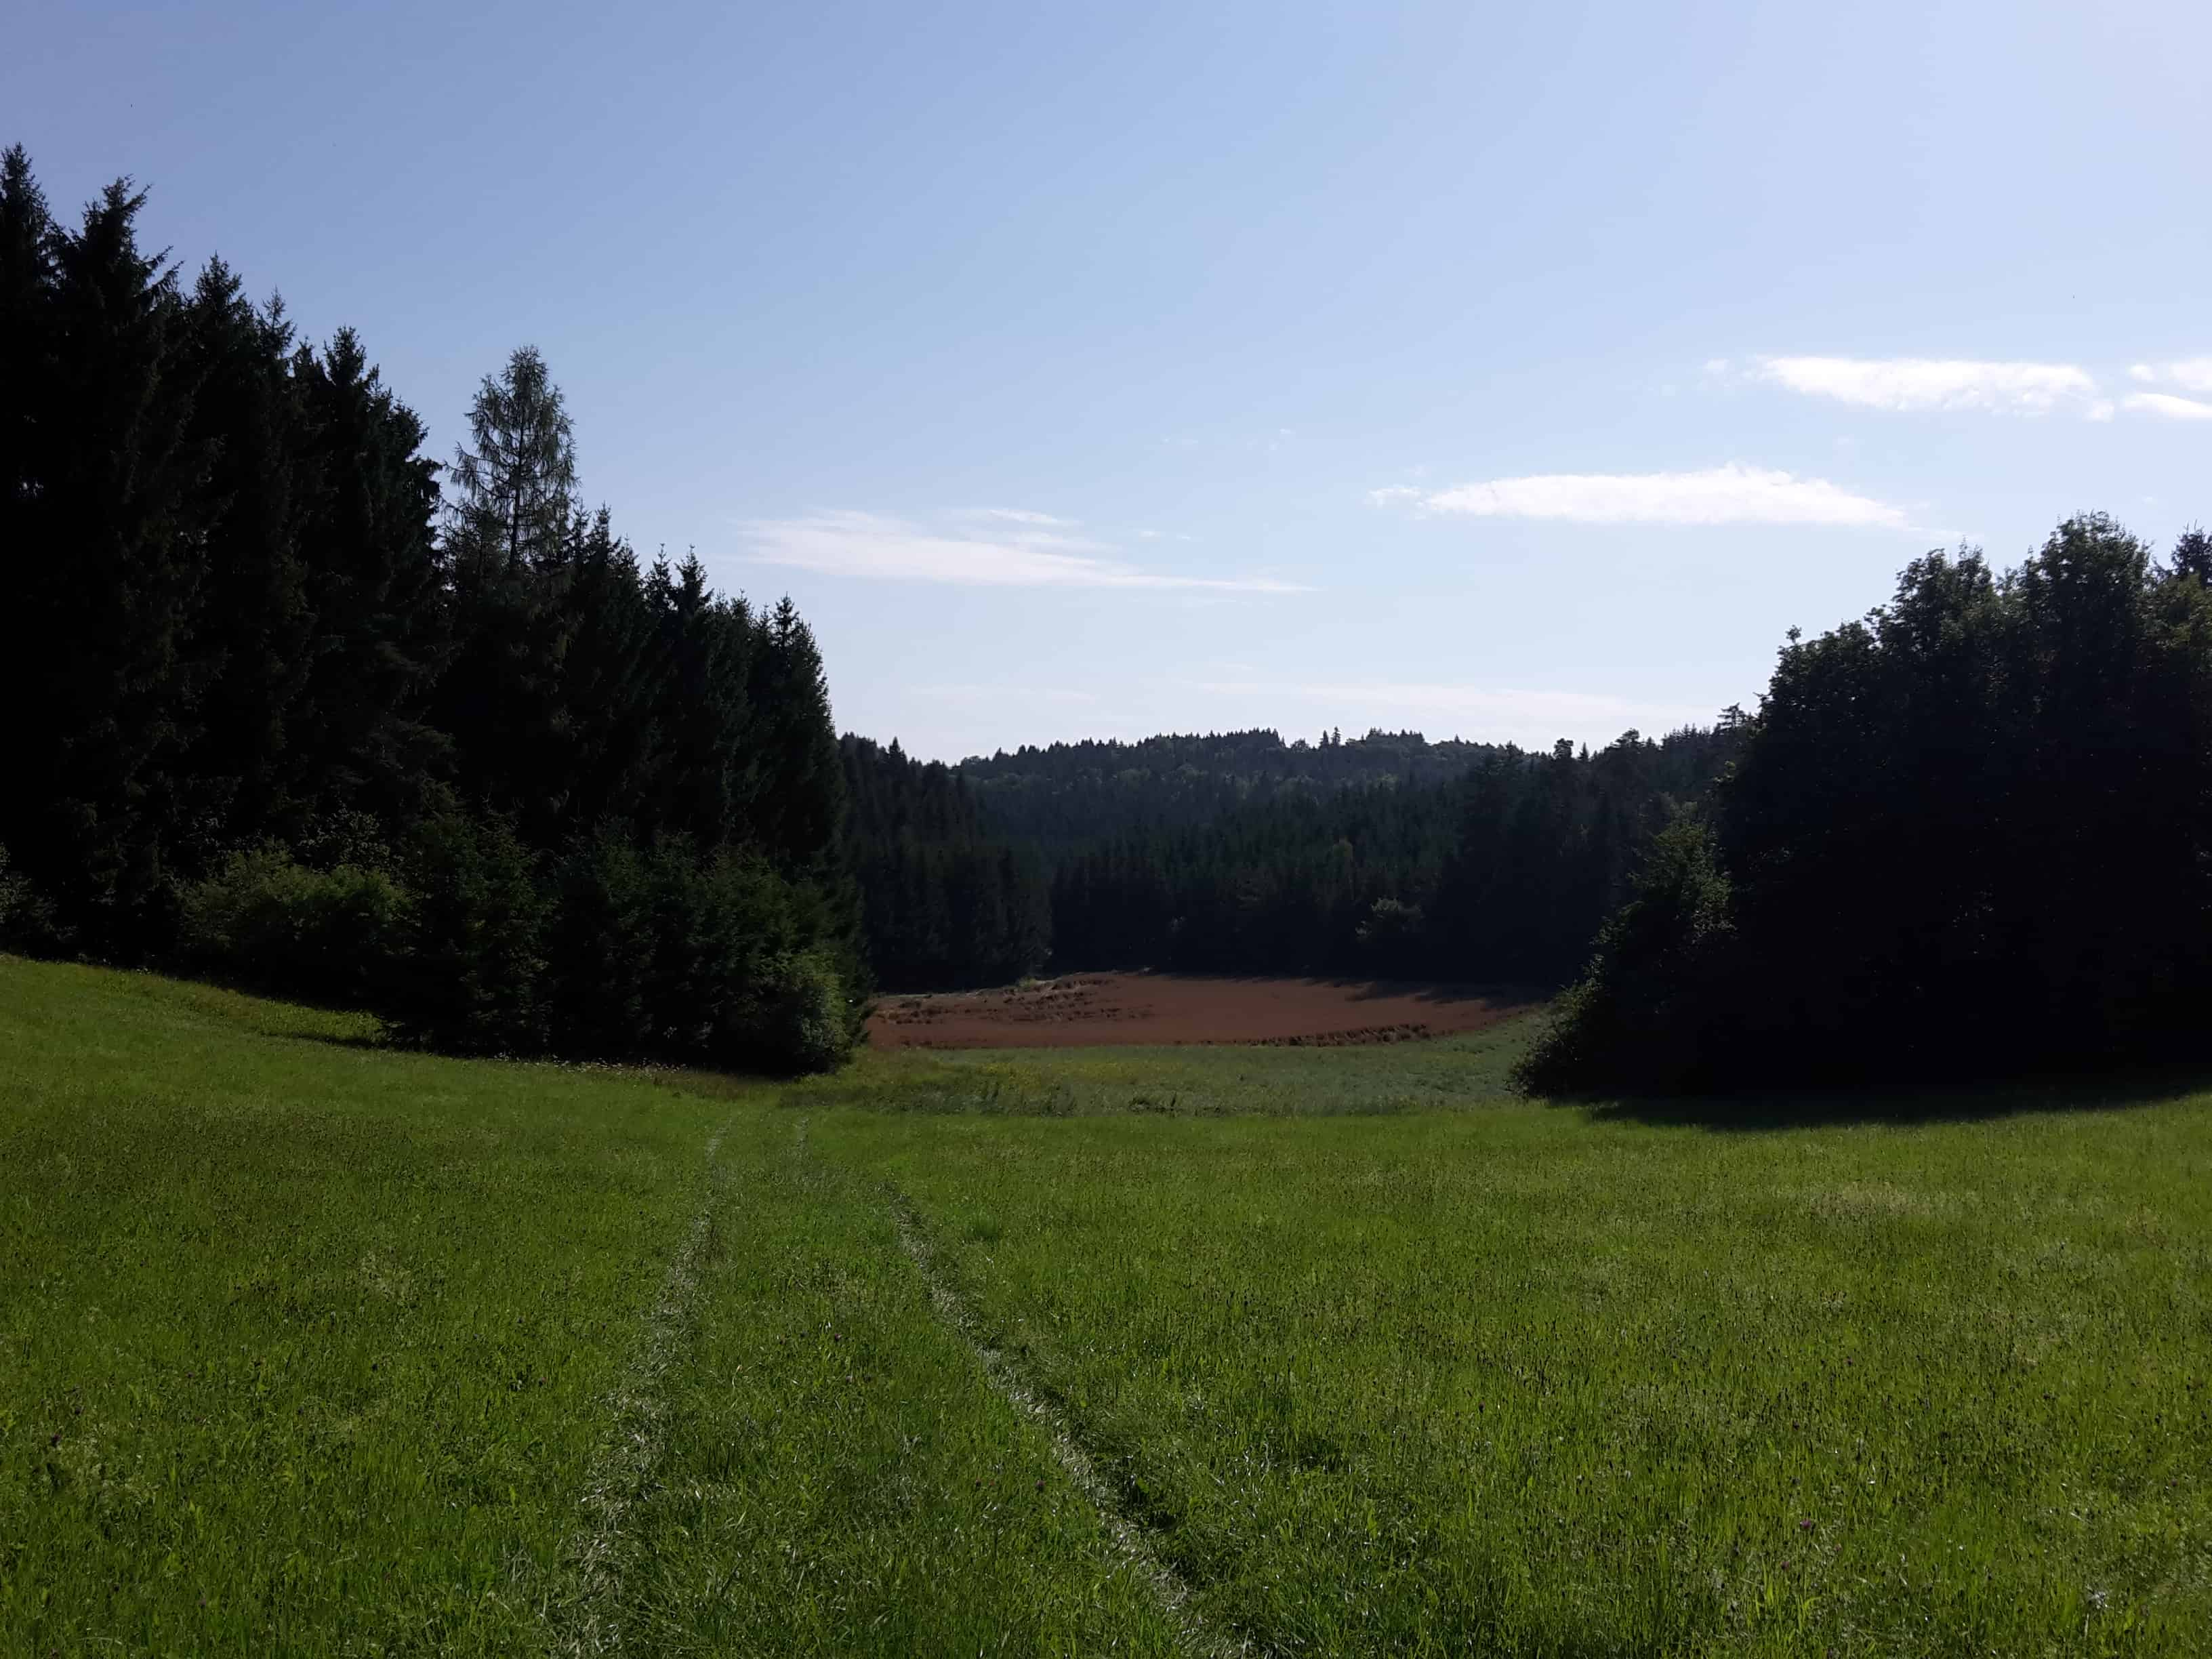 Zeckenschutz beim Wandern – Tipps & Tricks